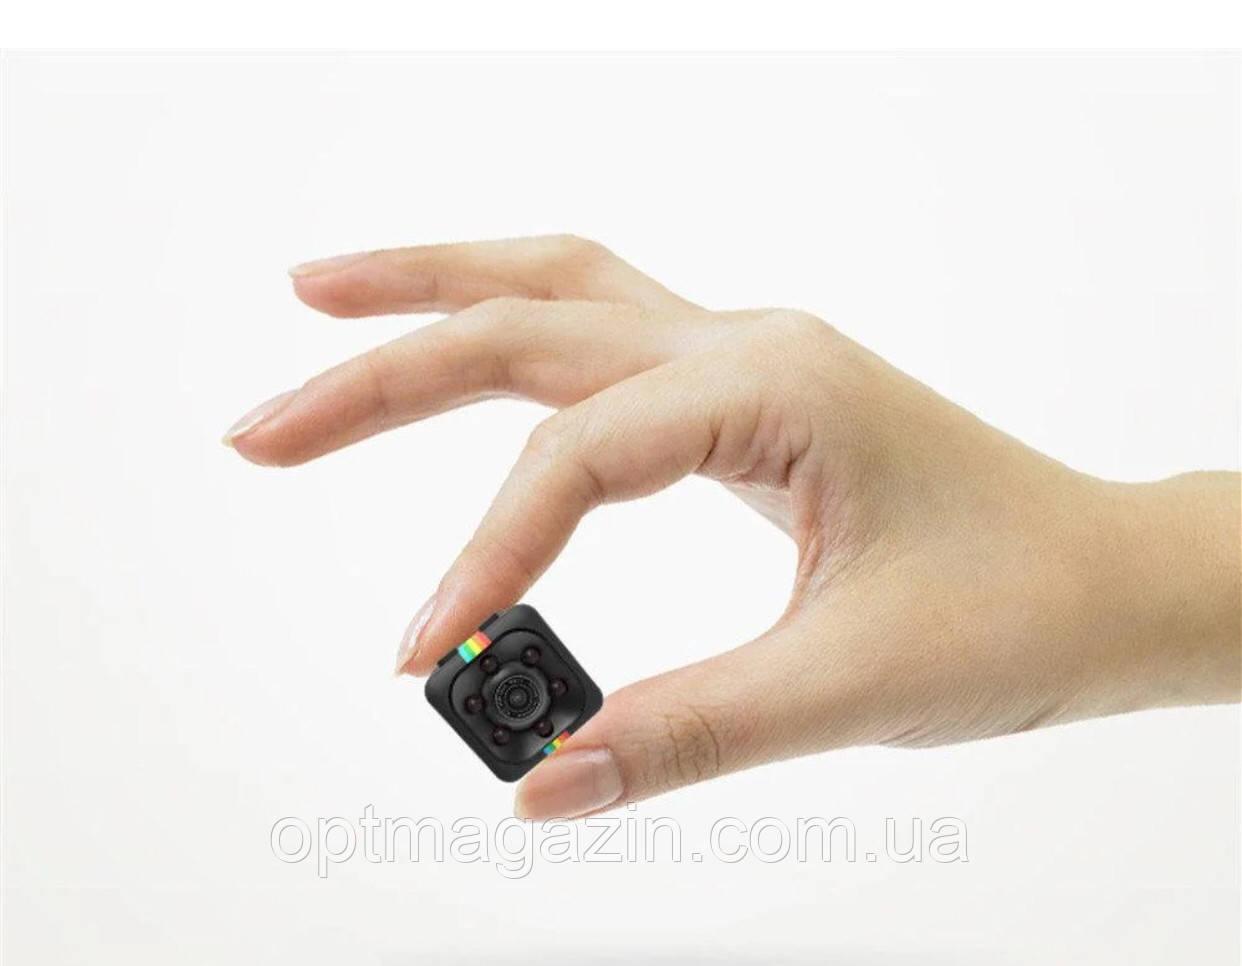 Міні камера (екшн камера) SQ11